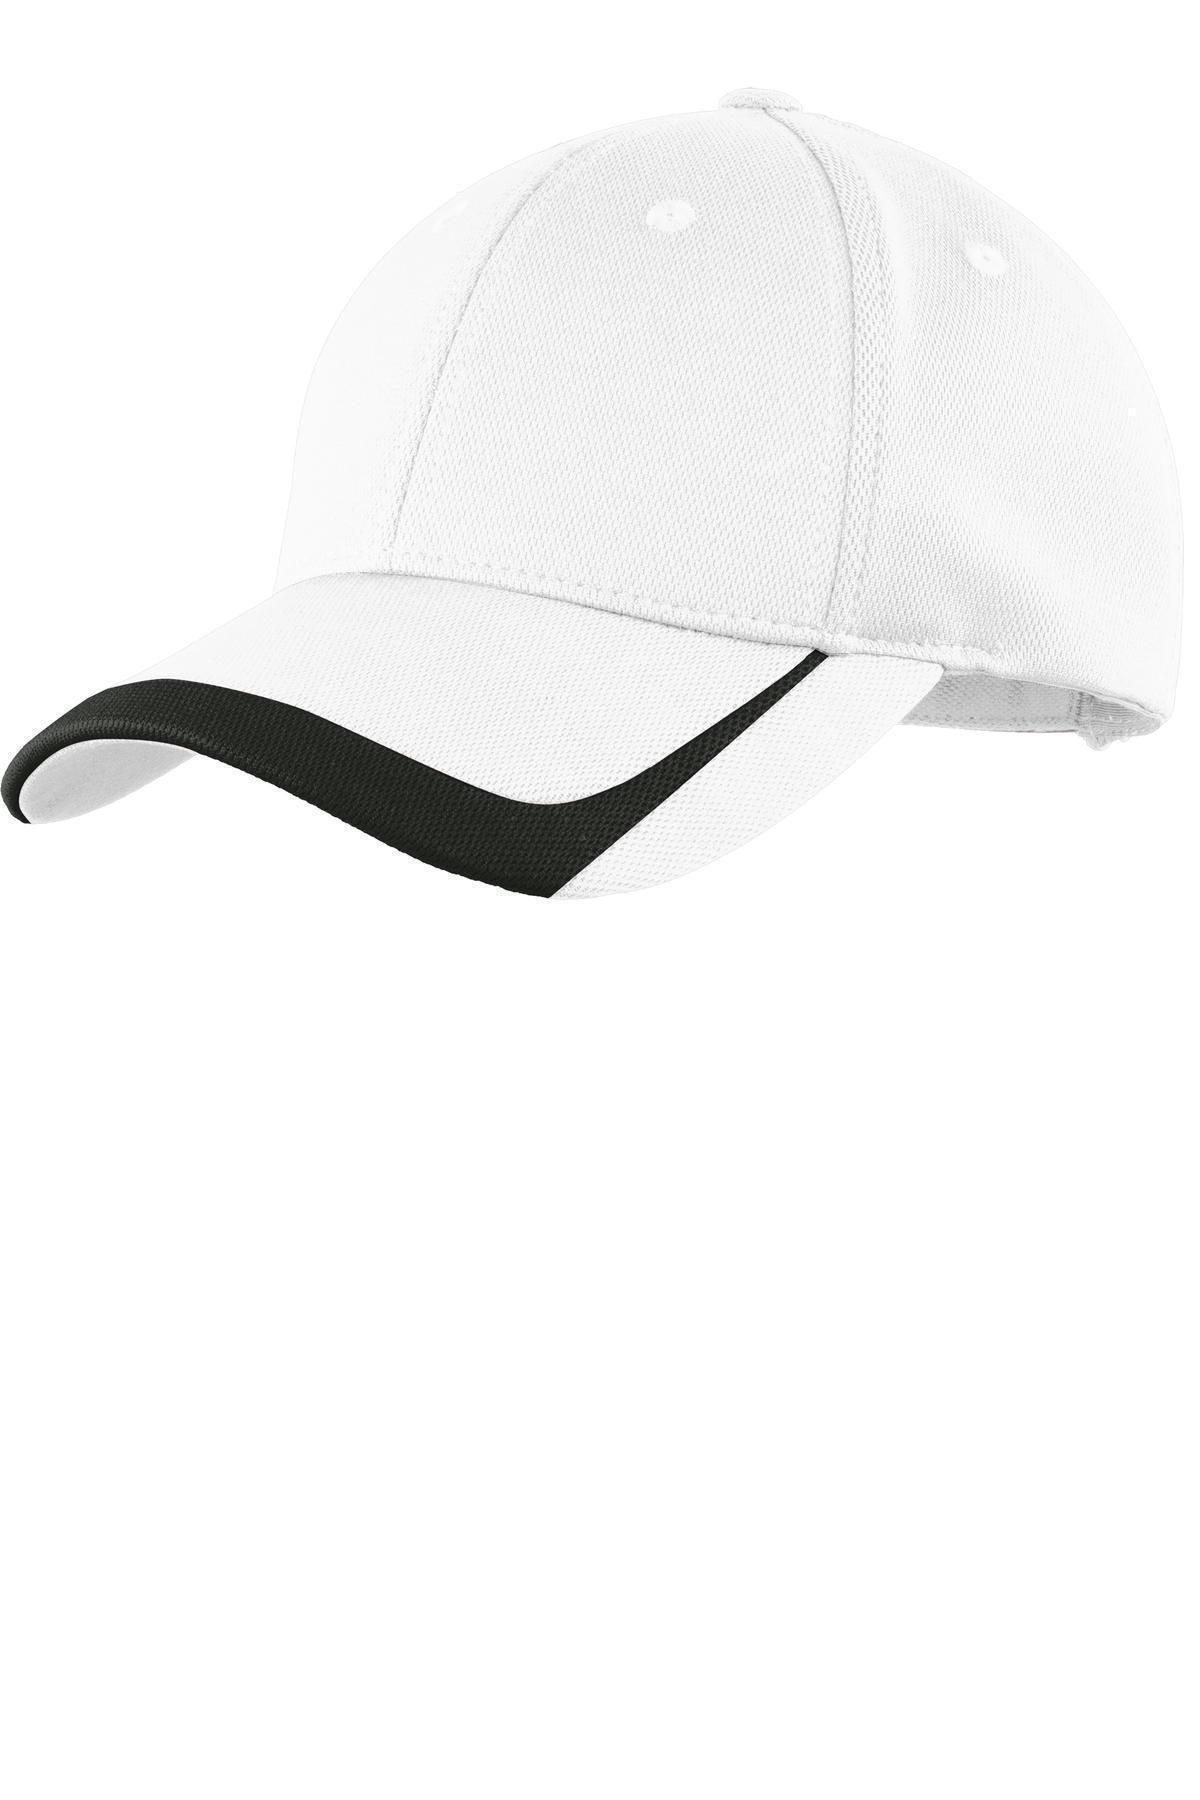 STC24 Sport-Tek Adult New Low Profile Hook Loop Colorblock Baseball Cap